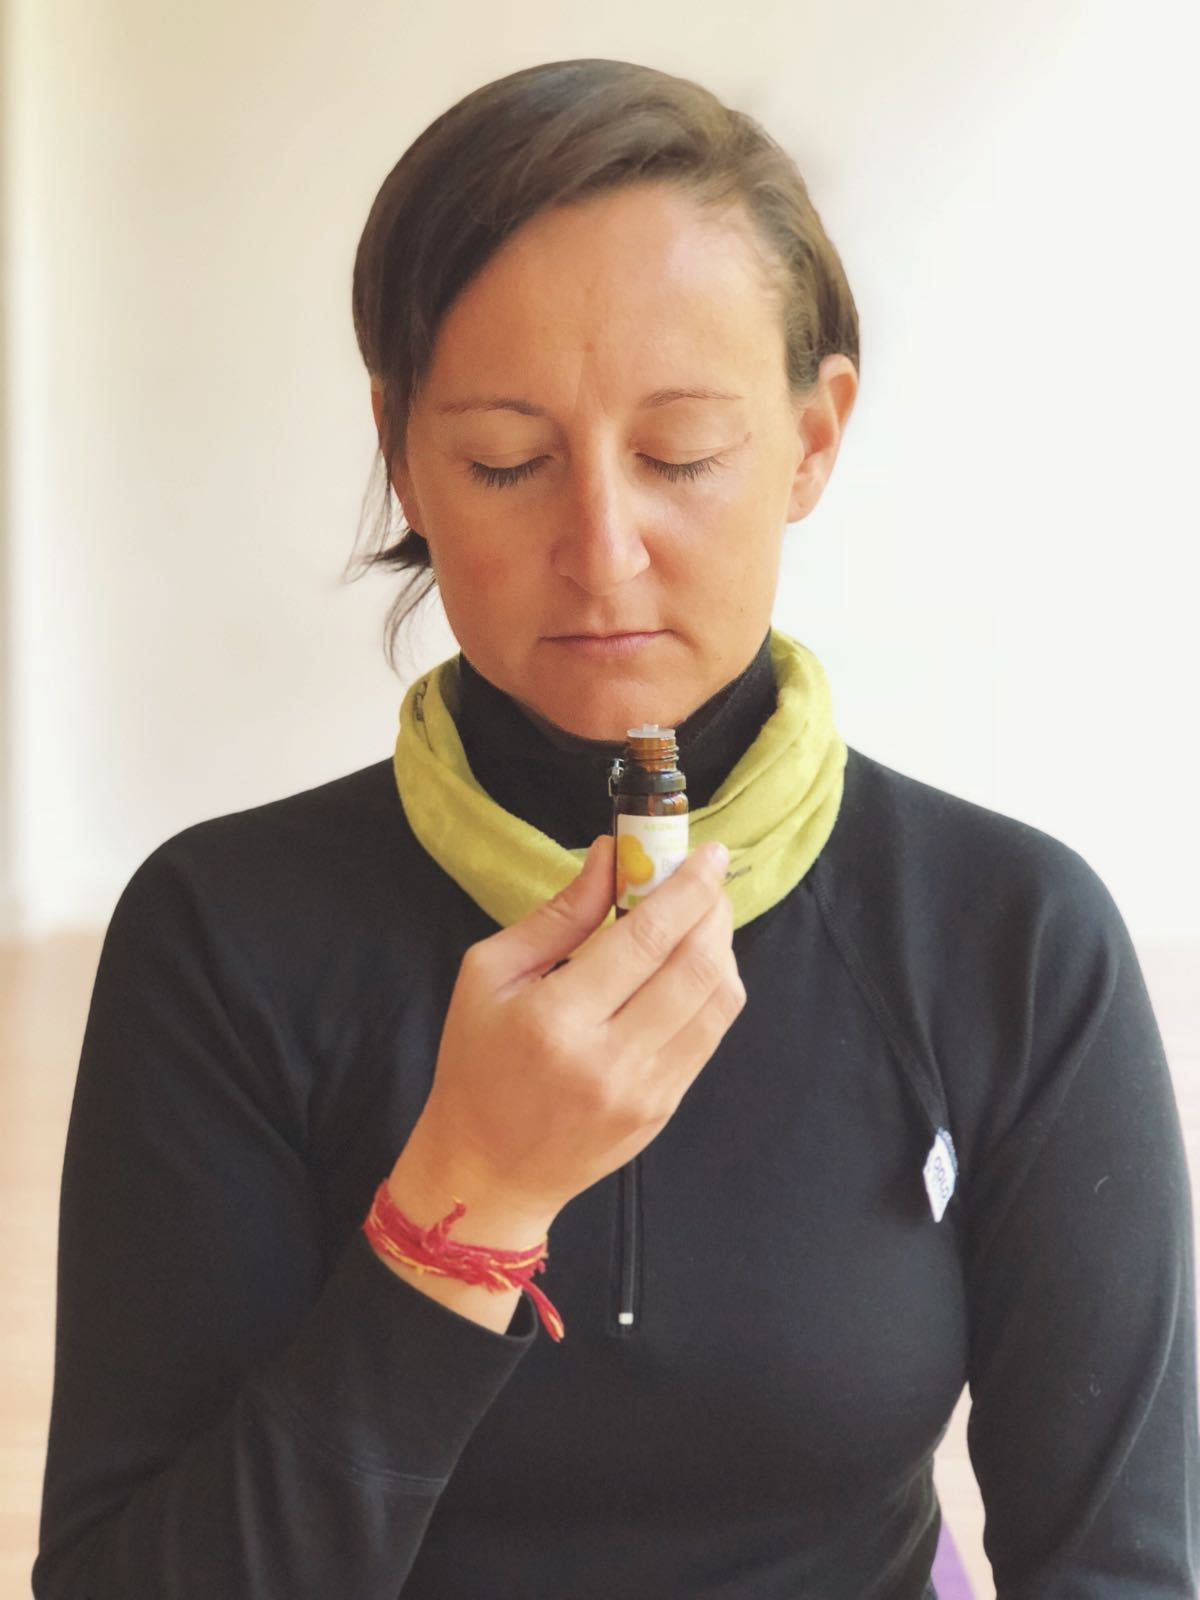 aceites esenciales, aromaterapia barcelona